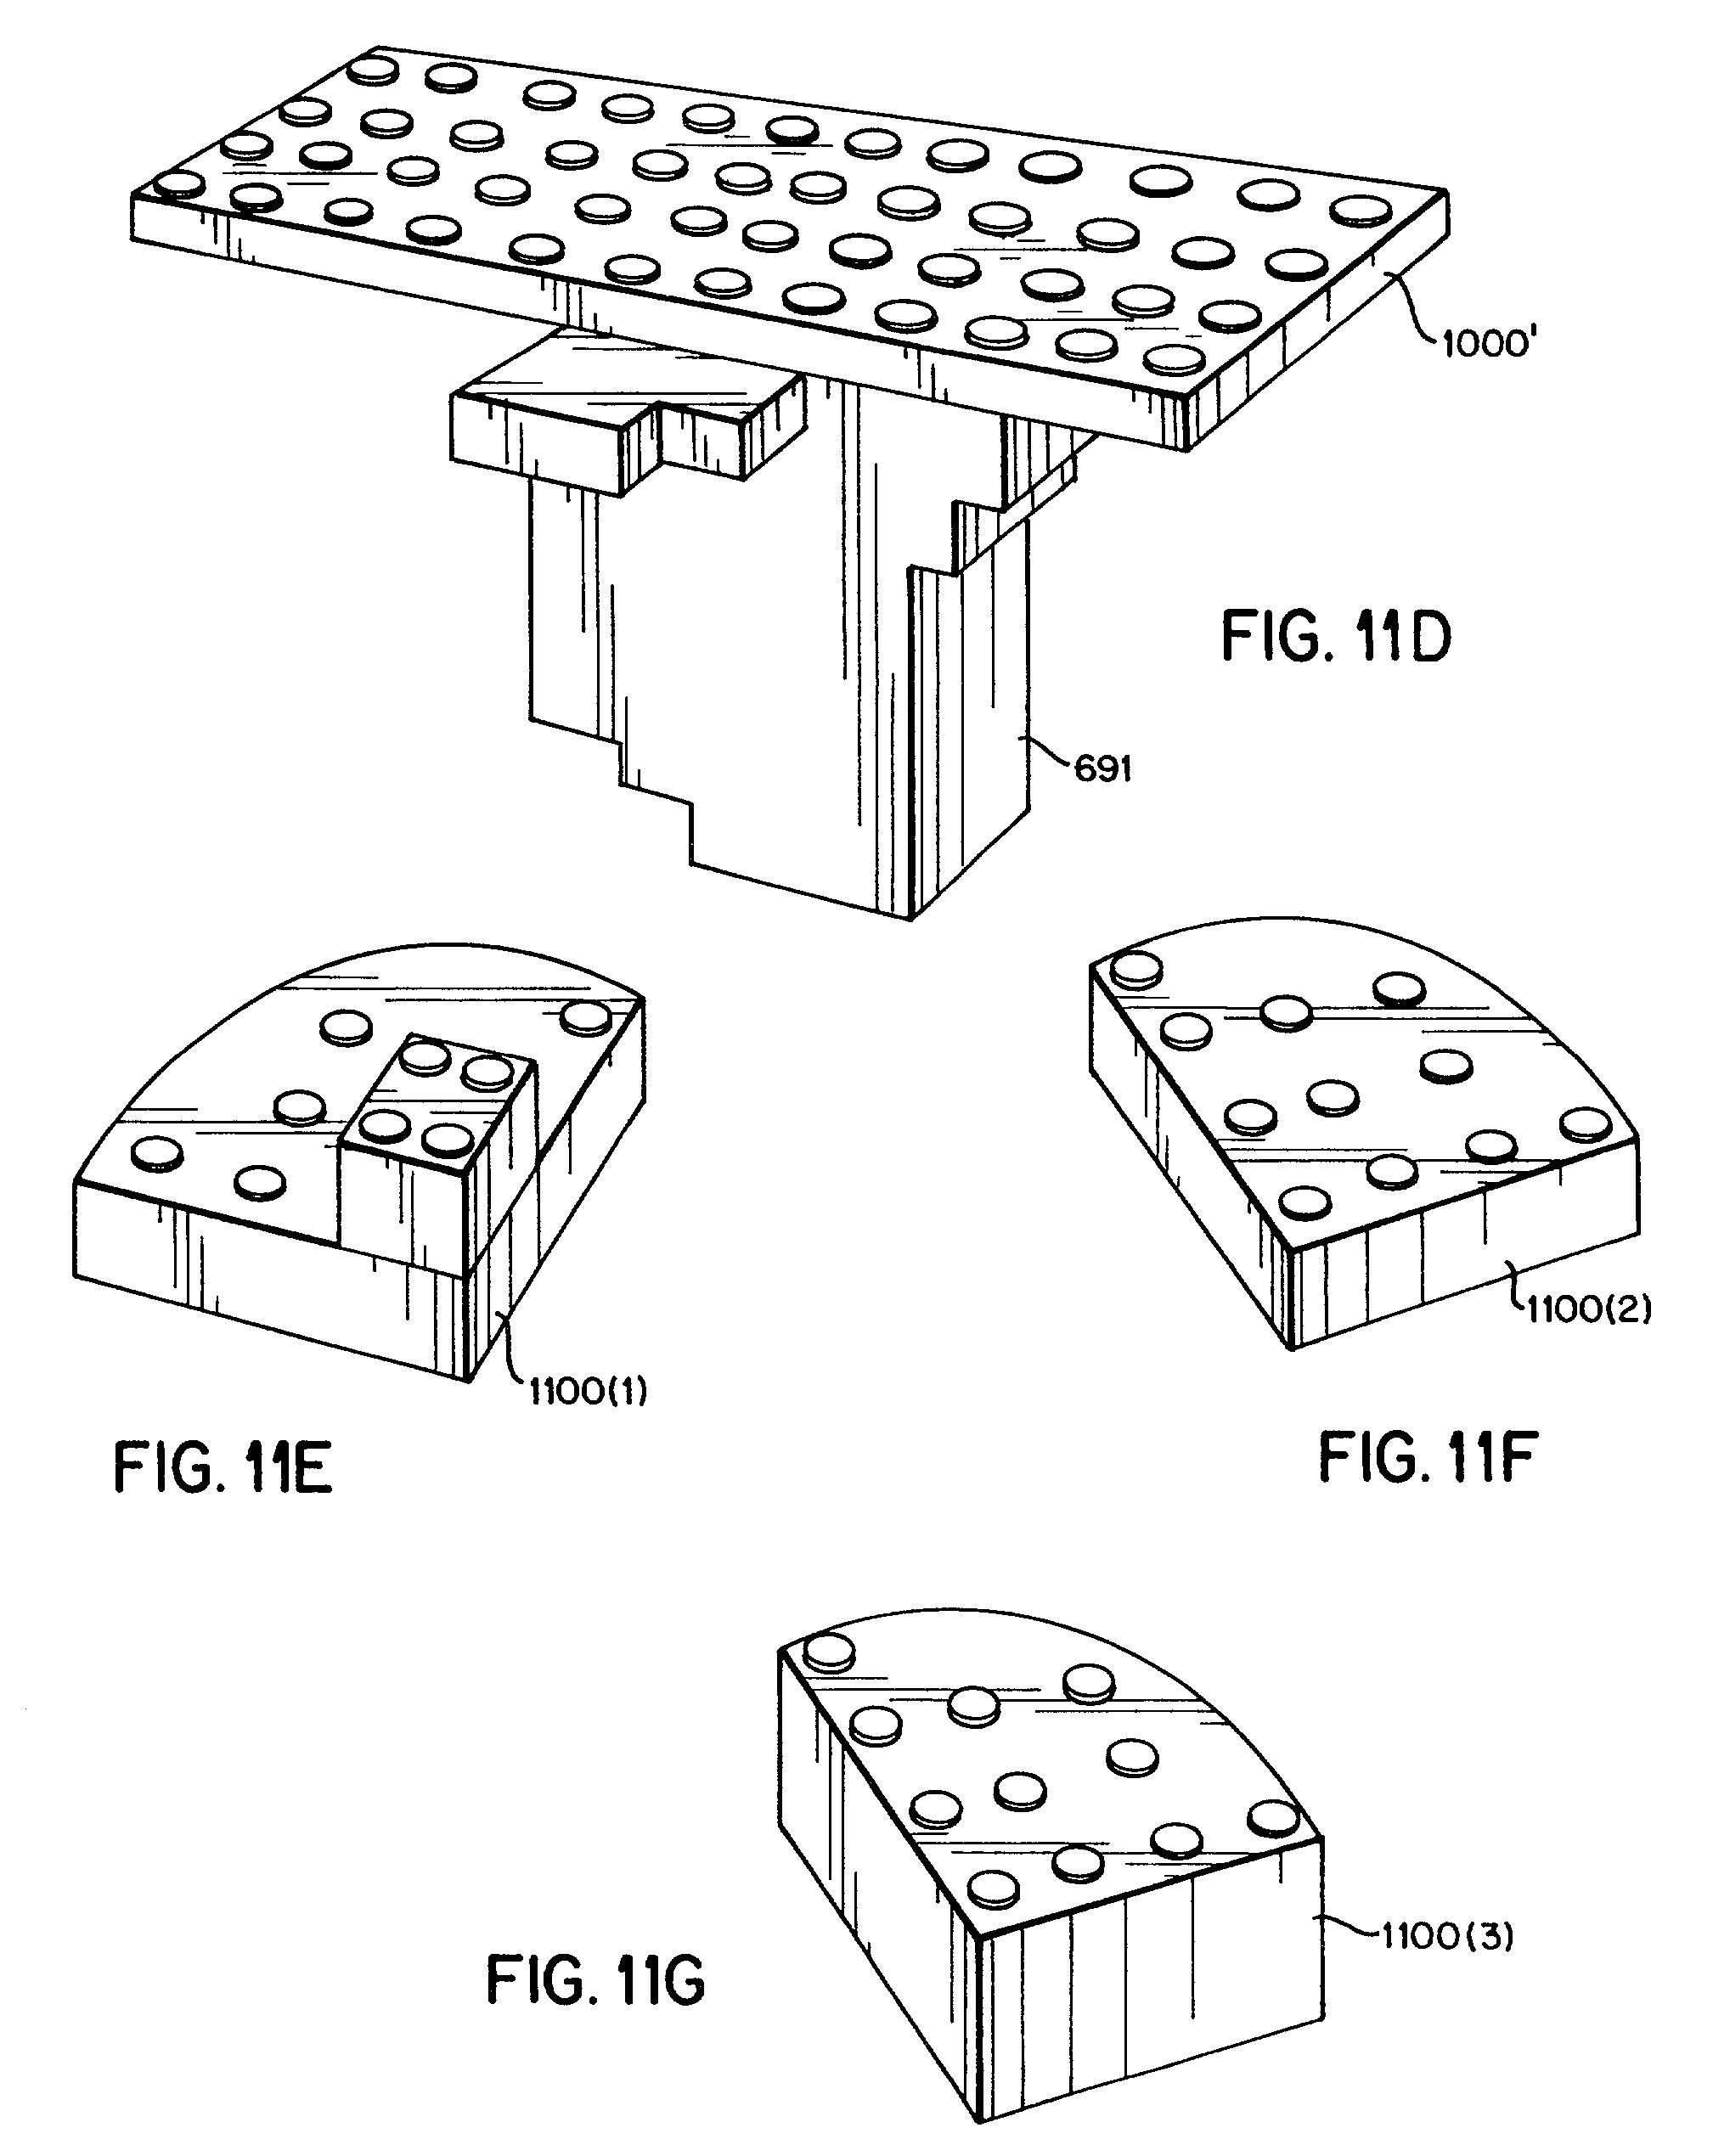 1956 packard clipper box wiring diagram 1953 Packard Patrician patent us 20020112171a1 1956 packard clipper inside 1956 packard clipper